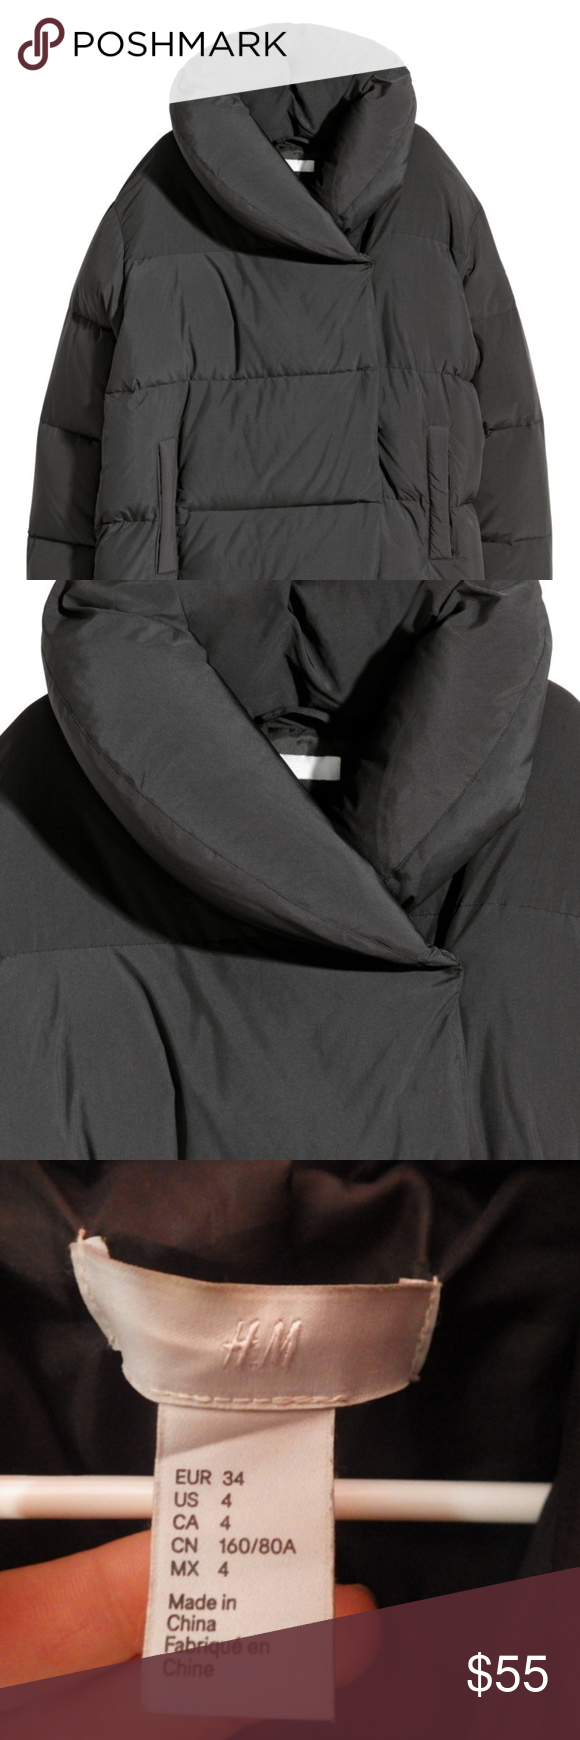 H&M Down Jacket Black Puffer Coat Never Worn Down Puffer